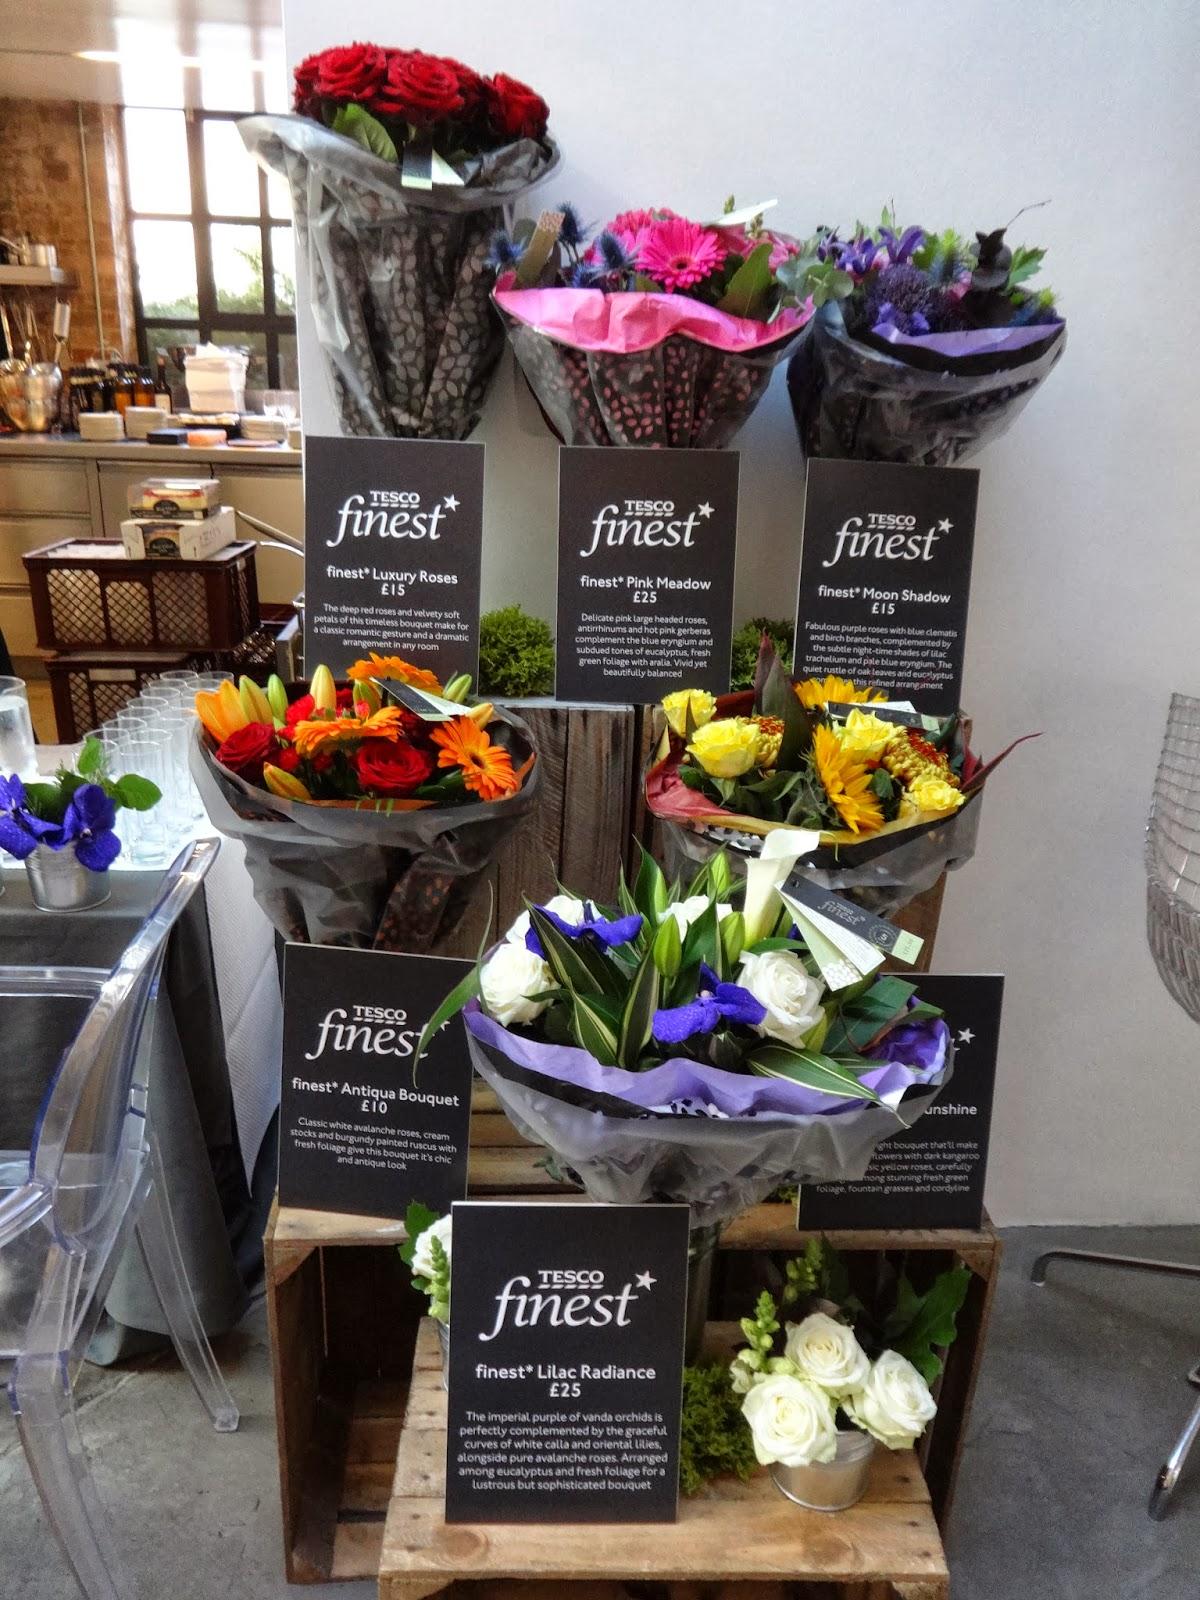 Tesco Finest Flower Bouquets Images - Flower Wallpaper HD